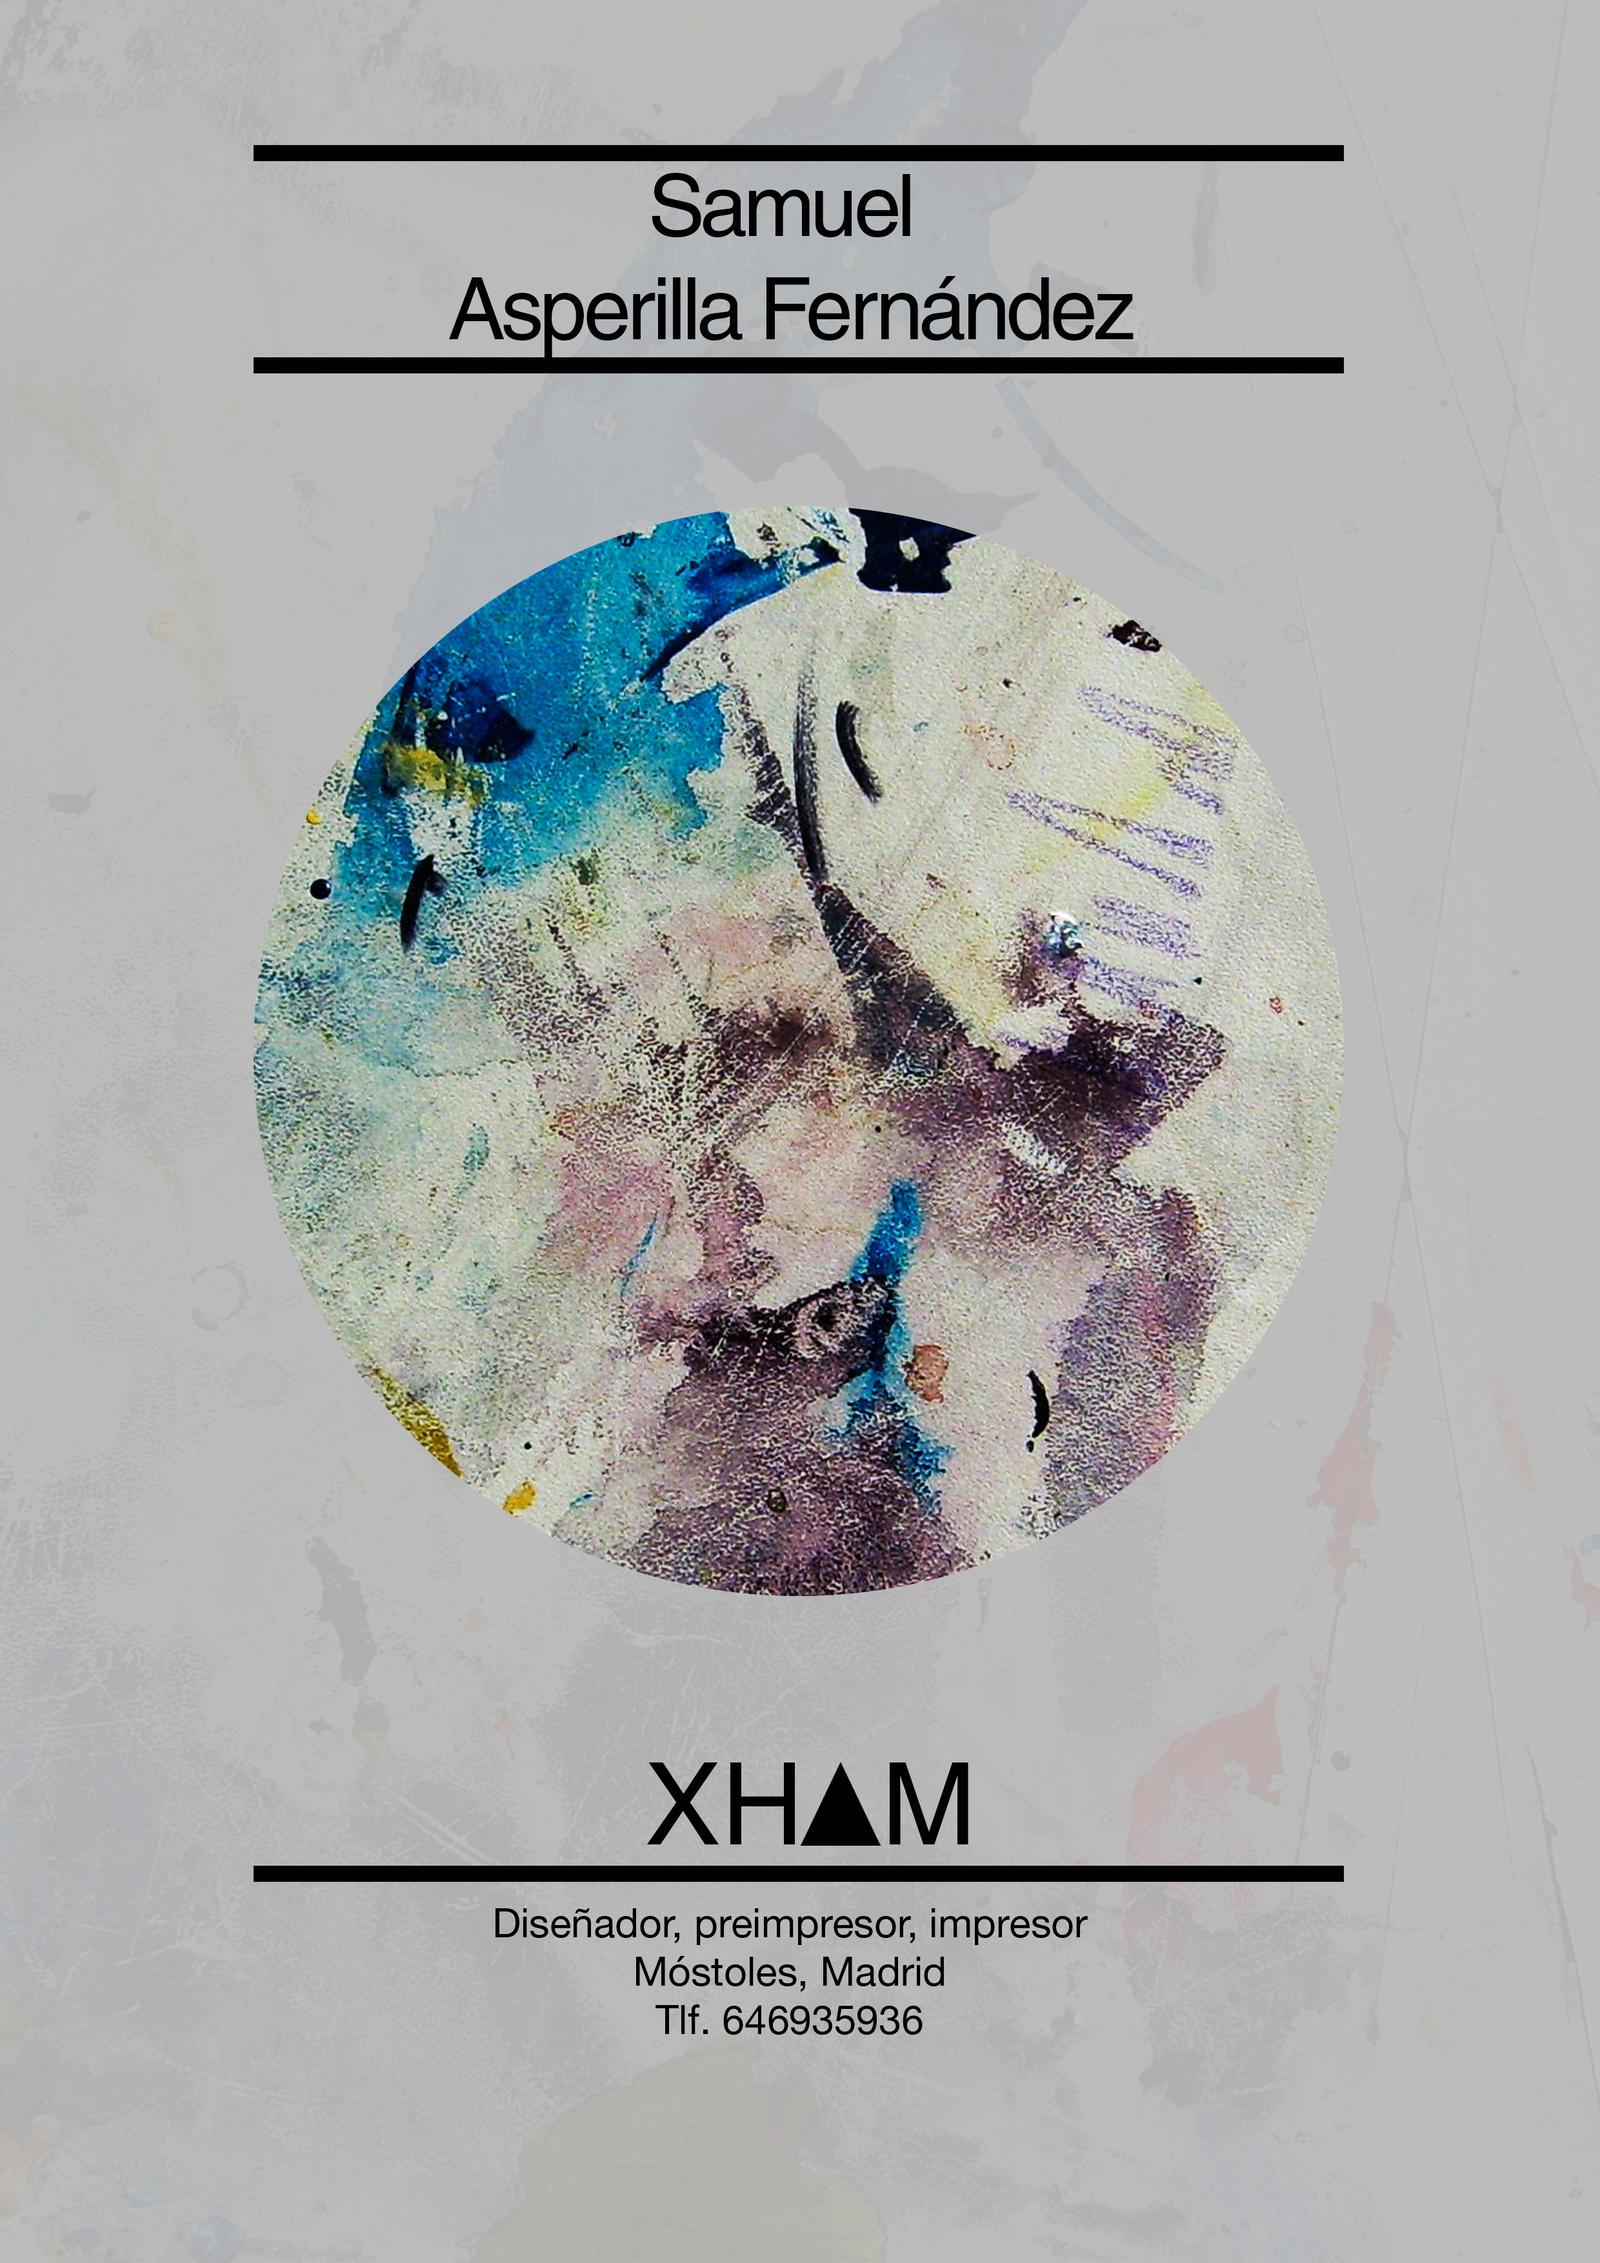 Dark-Xham's Profile Picture